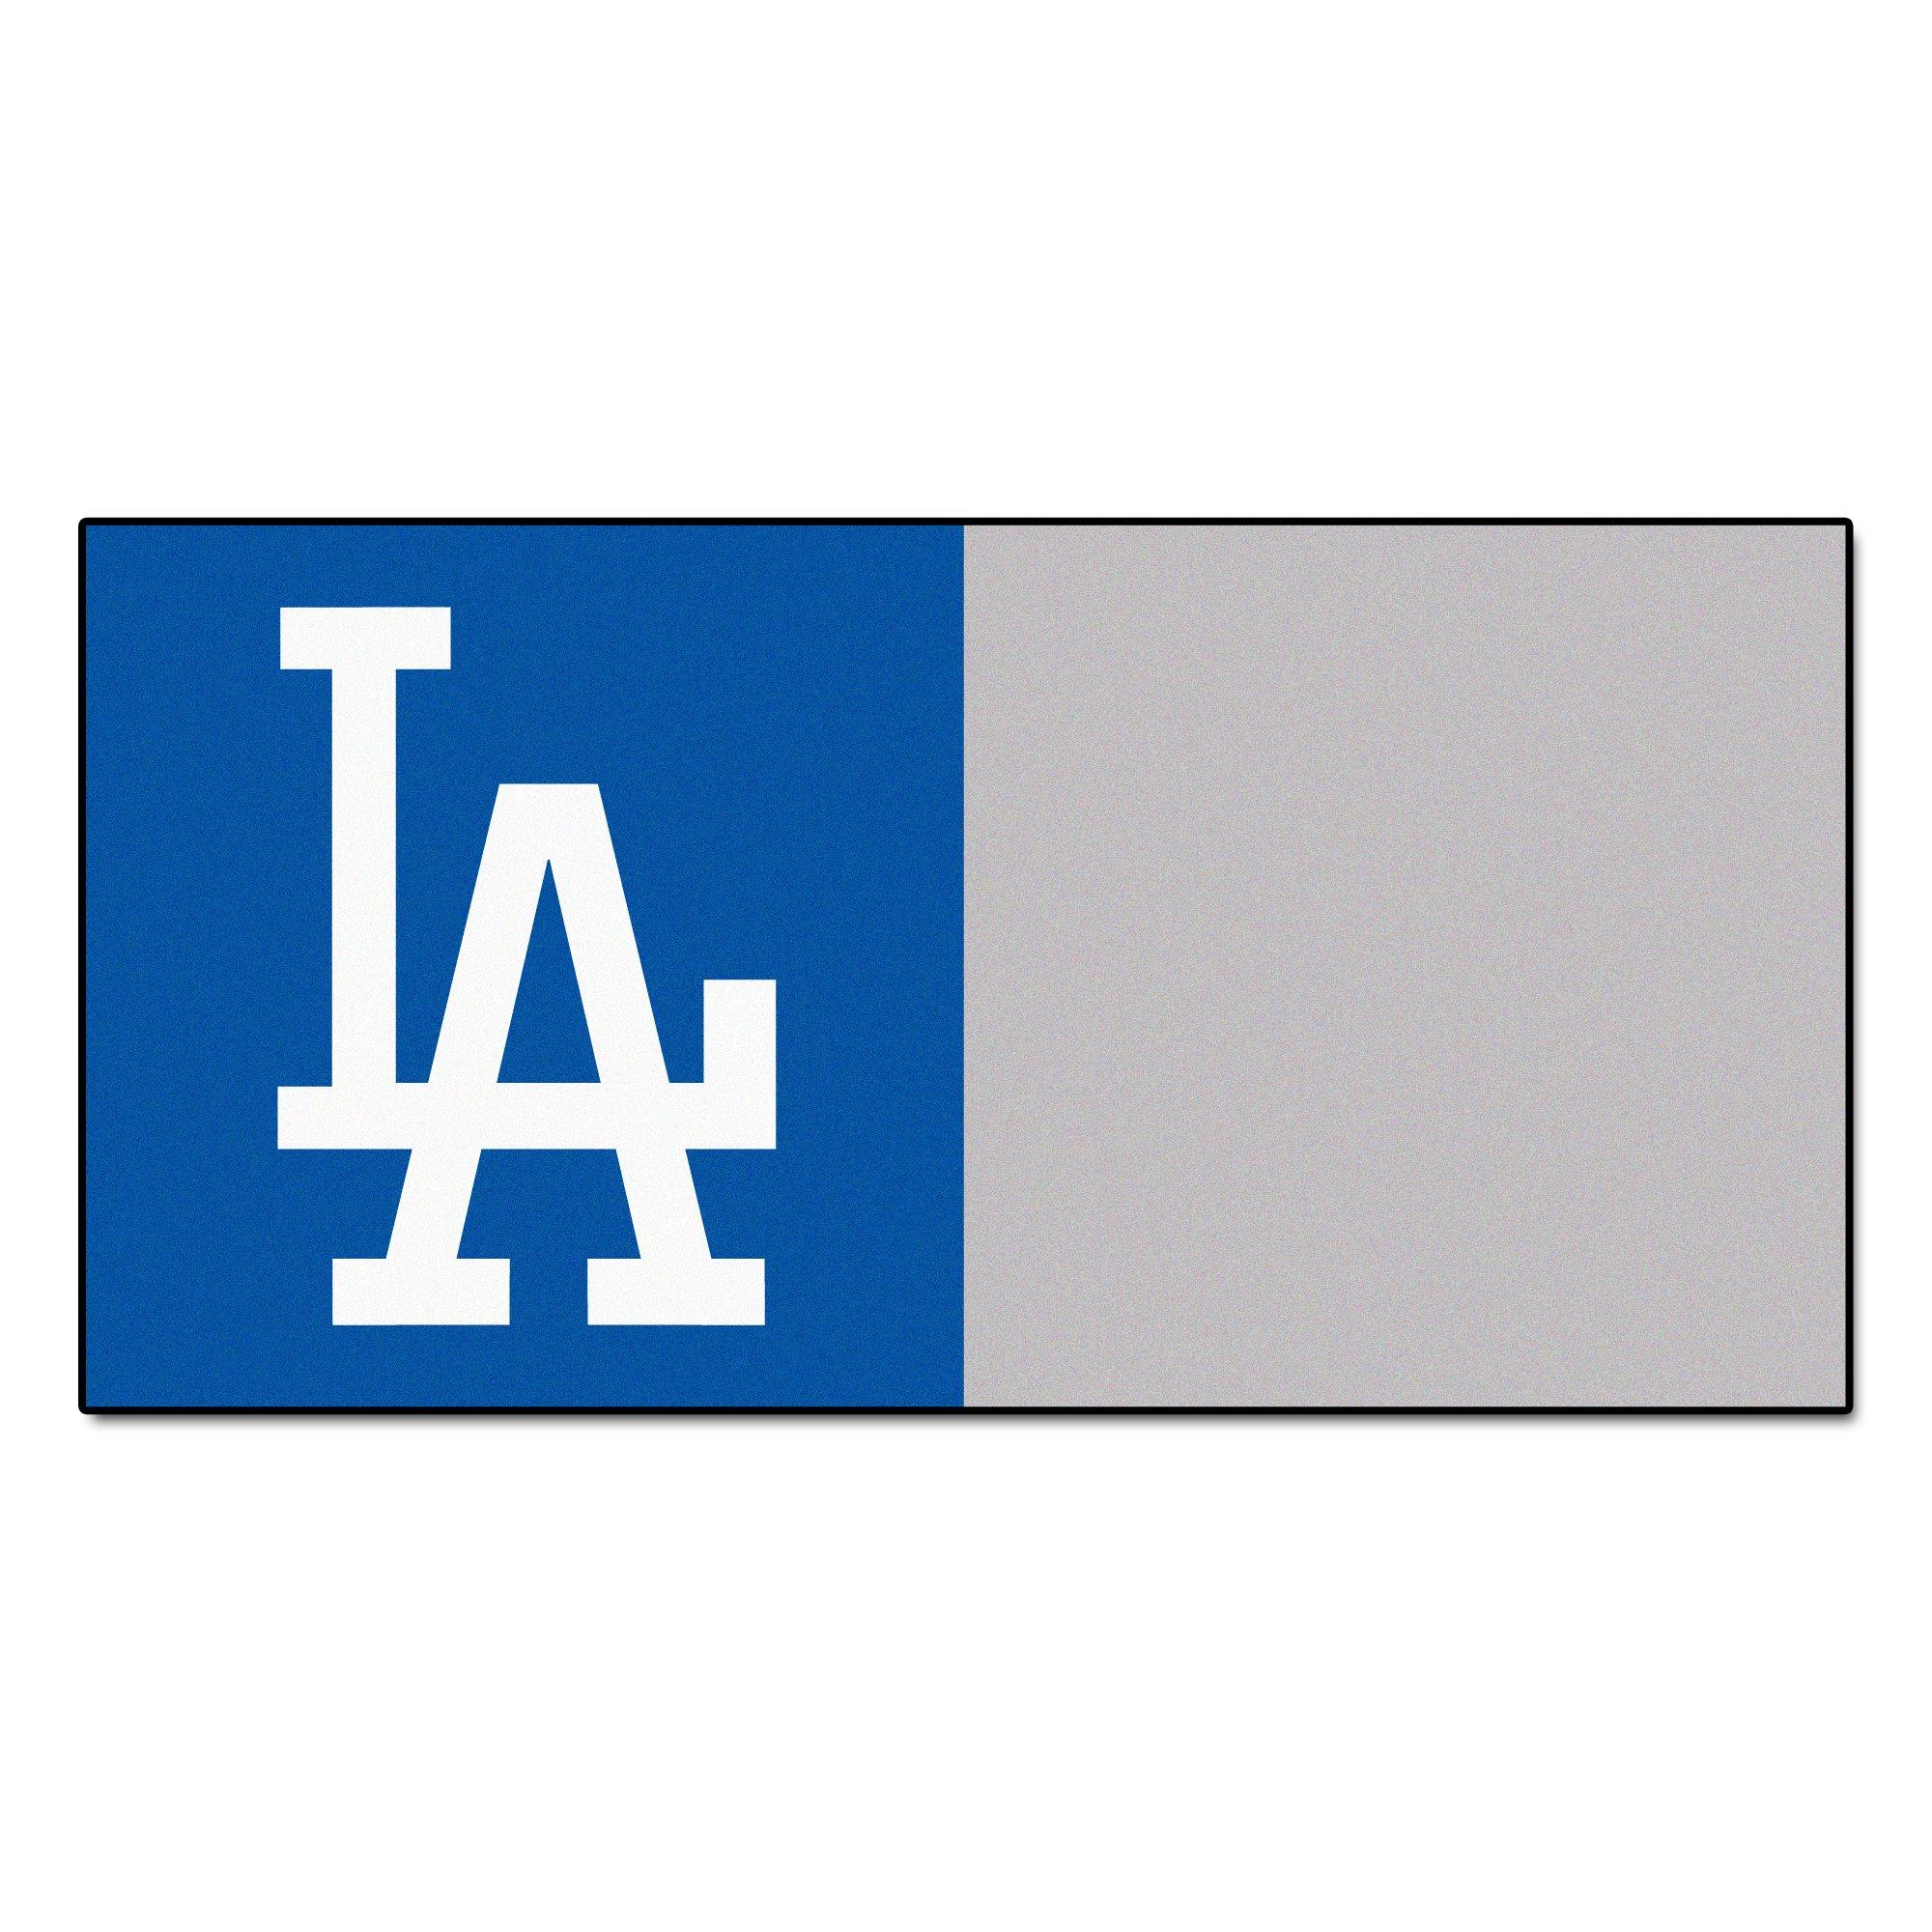 FANMATS MLB Los Angeles Dodgers Nylon Face Team Carpet Tiles by Fanmats